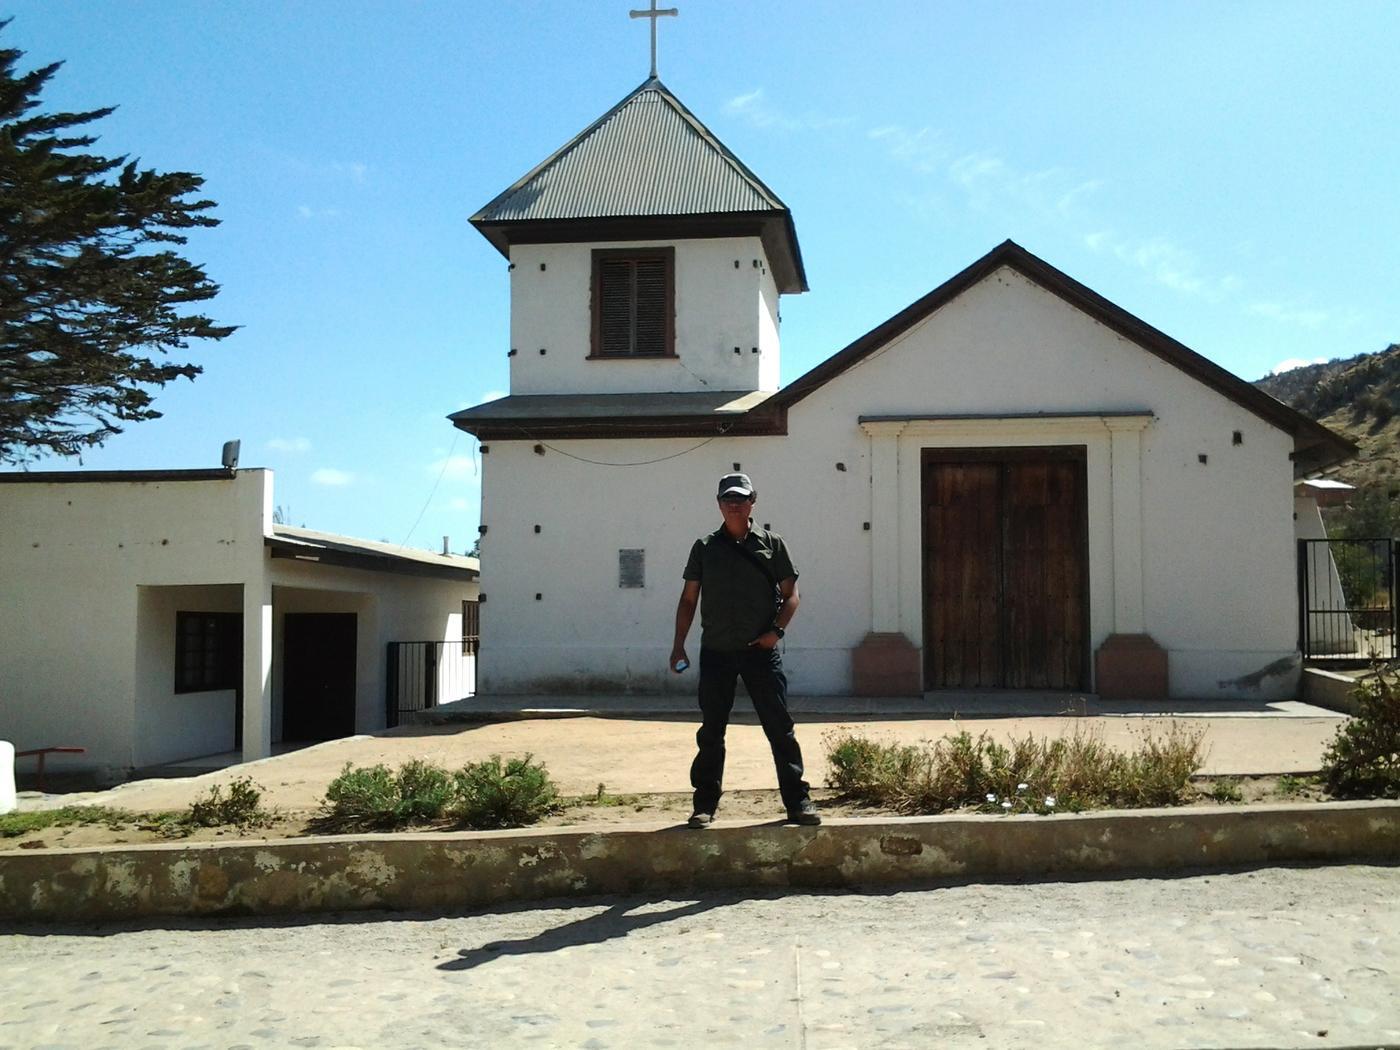 Yerko D. Barraza C.